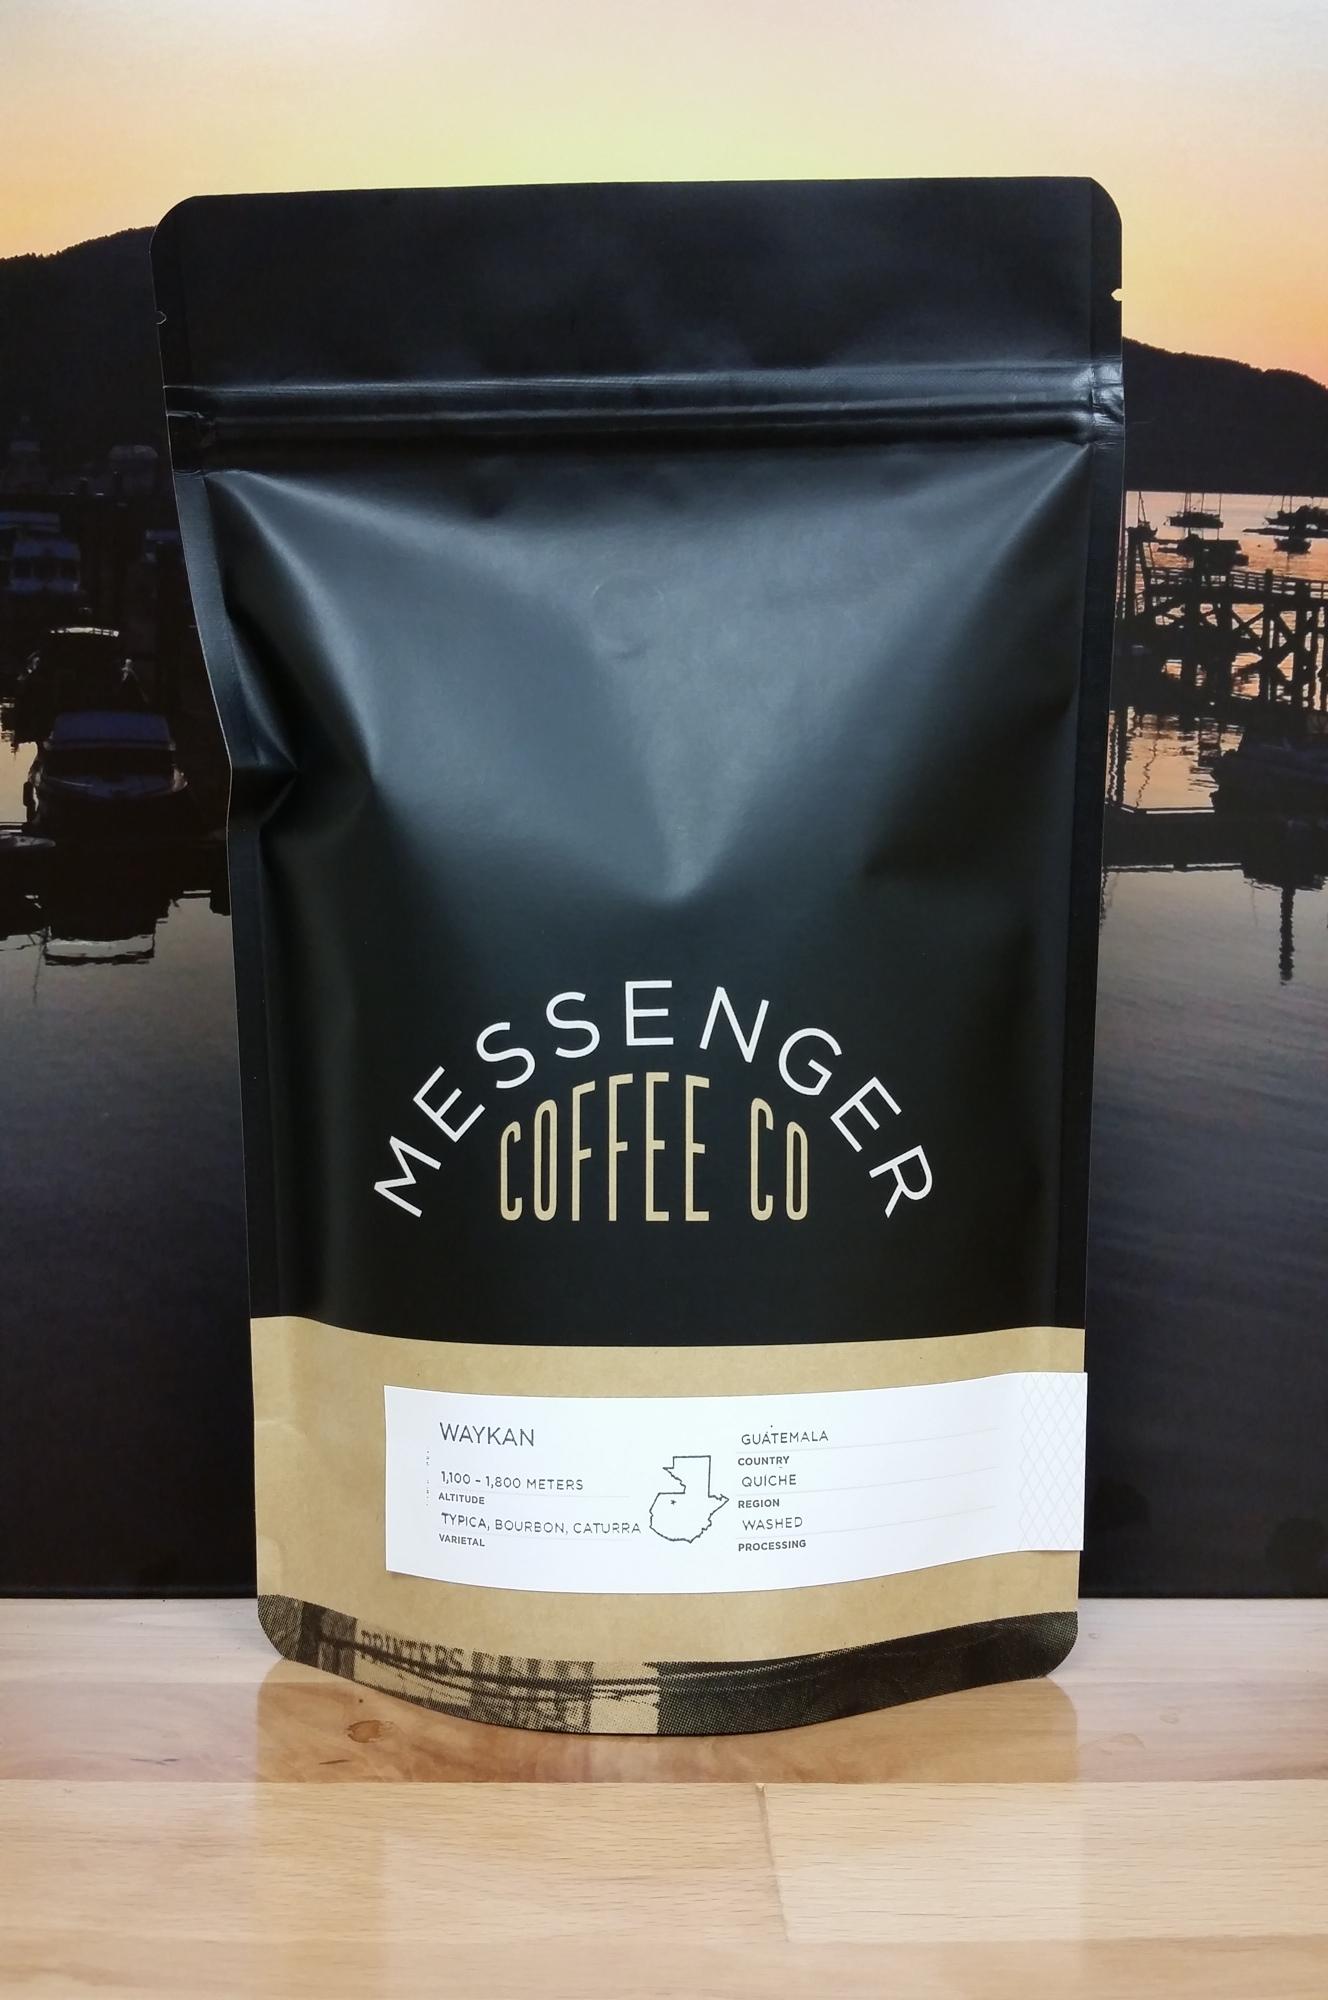 Guatemala Waykan from Messenger Coffee